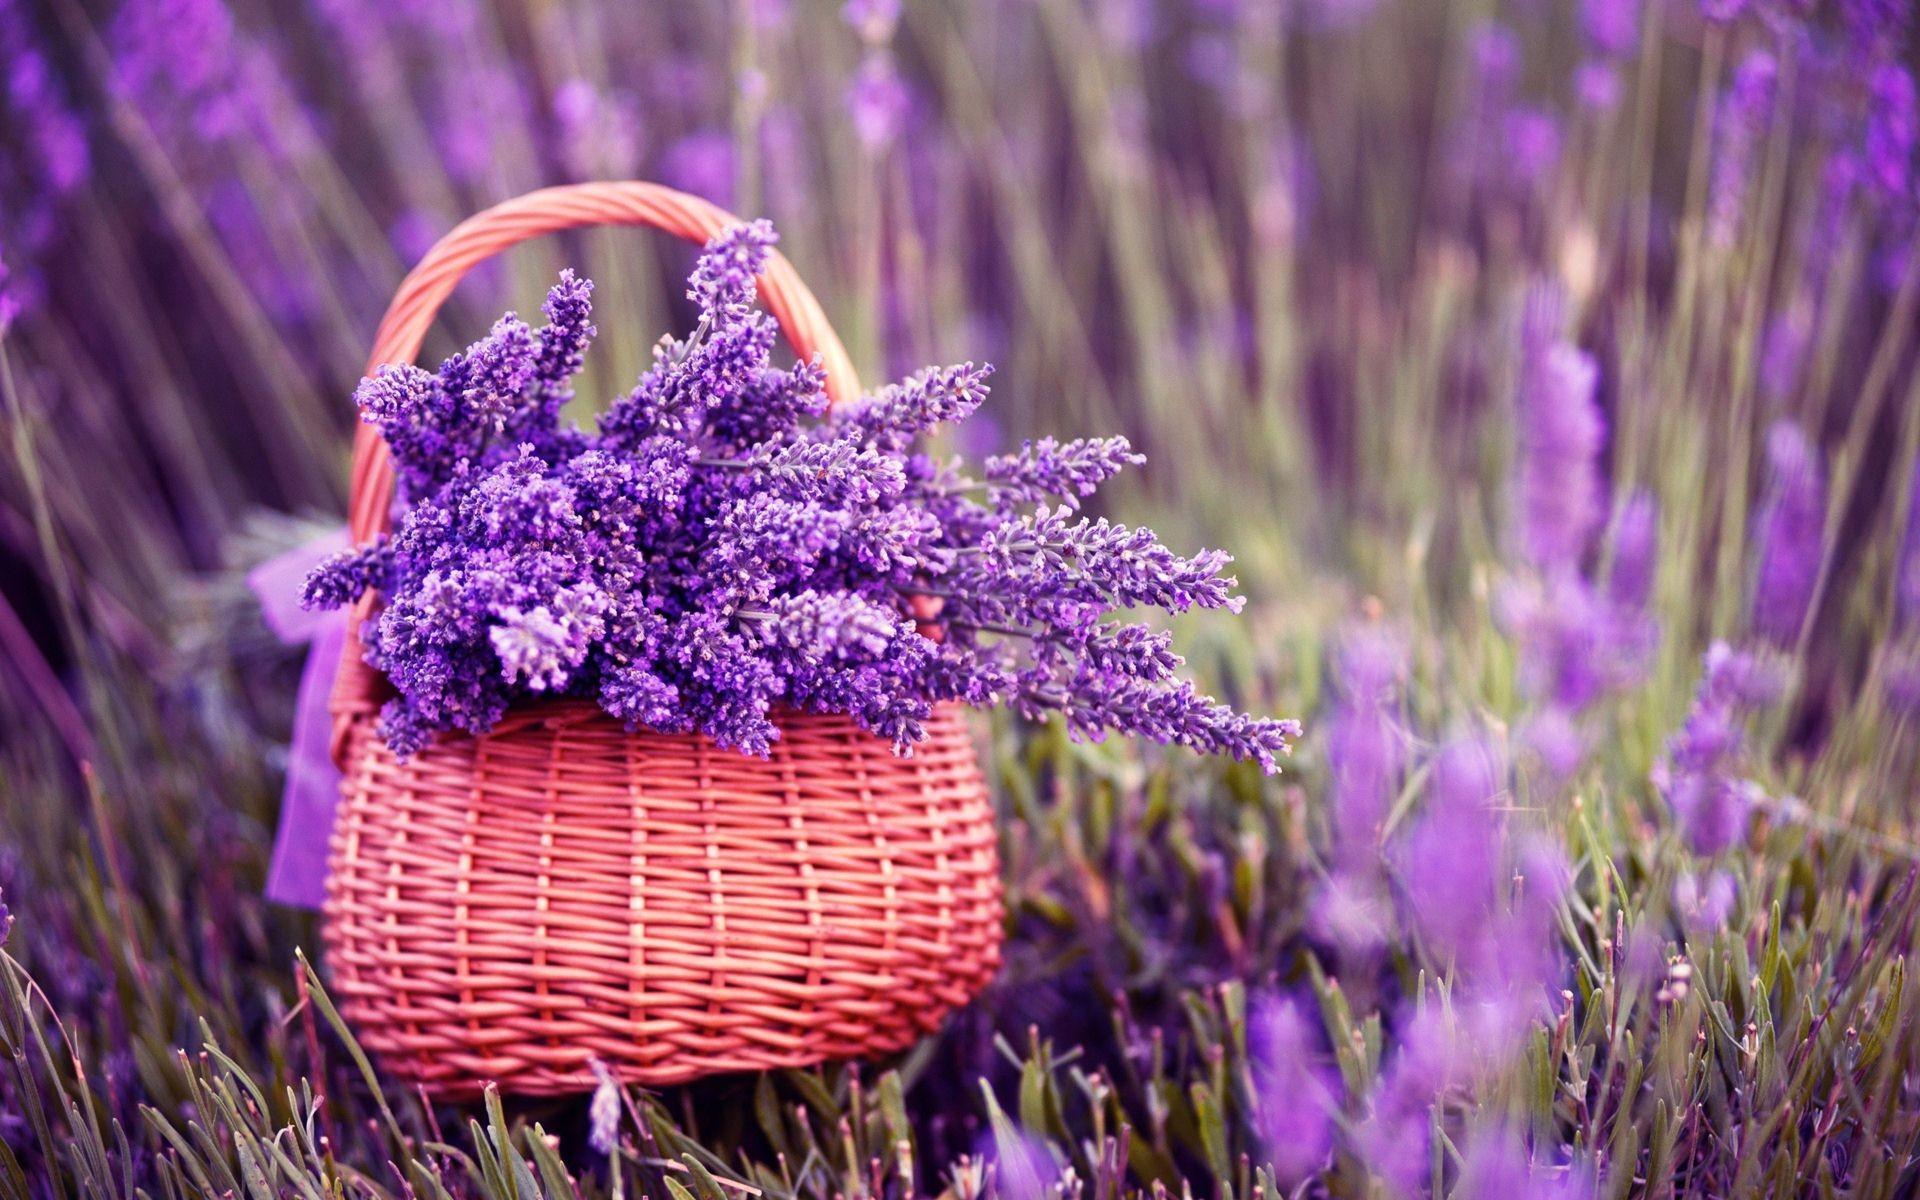 Supreme Wallpaper Iphone X Lavender Background 43 Images